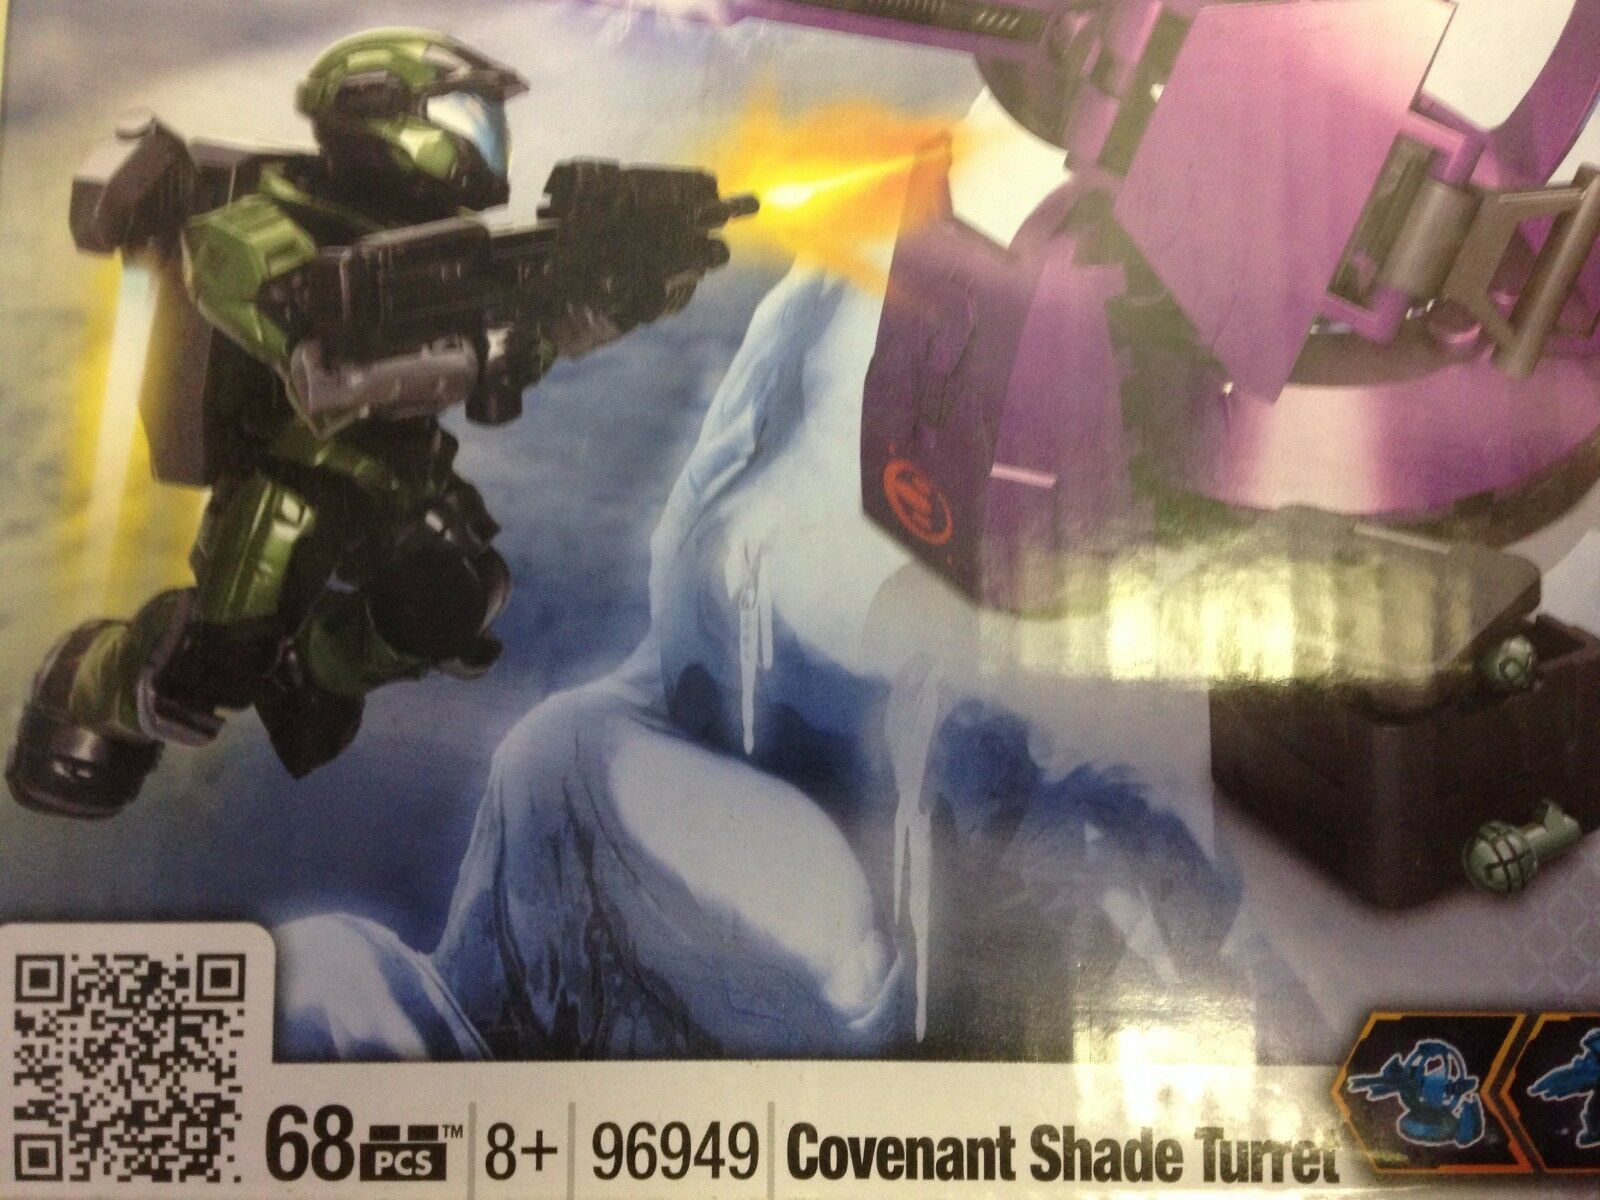 HALO MEGA BLOKS    COVENANT SHADE TURRET    BNIB   96949 5ff82f